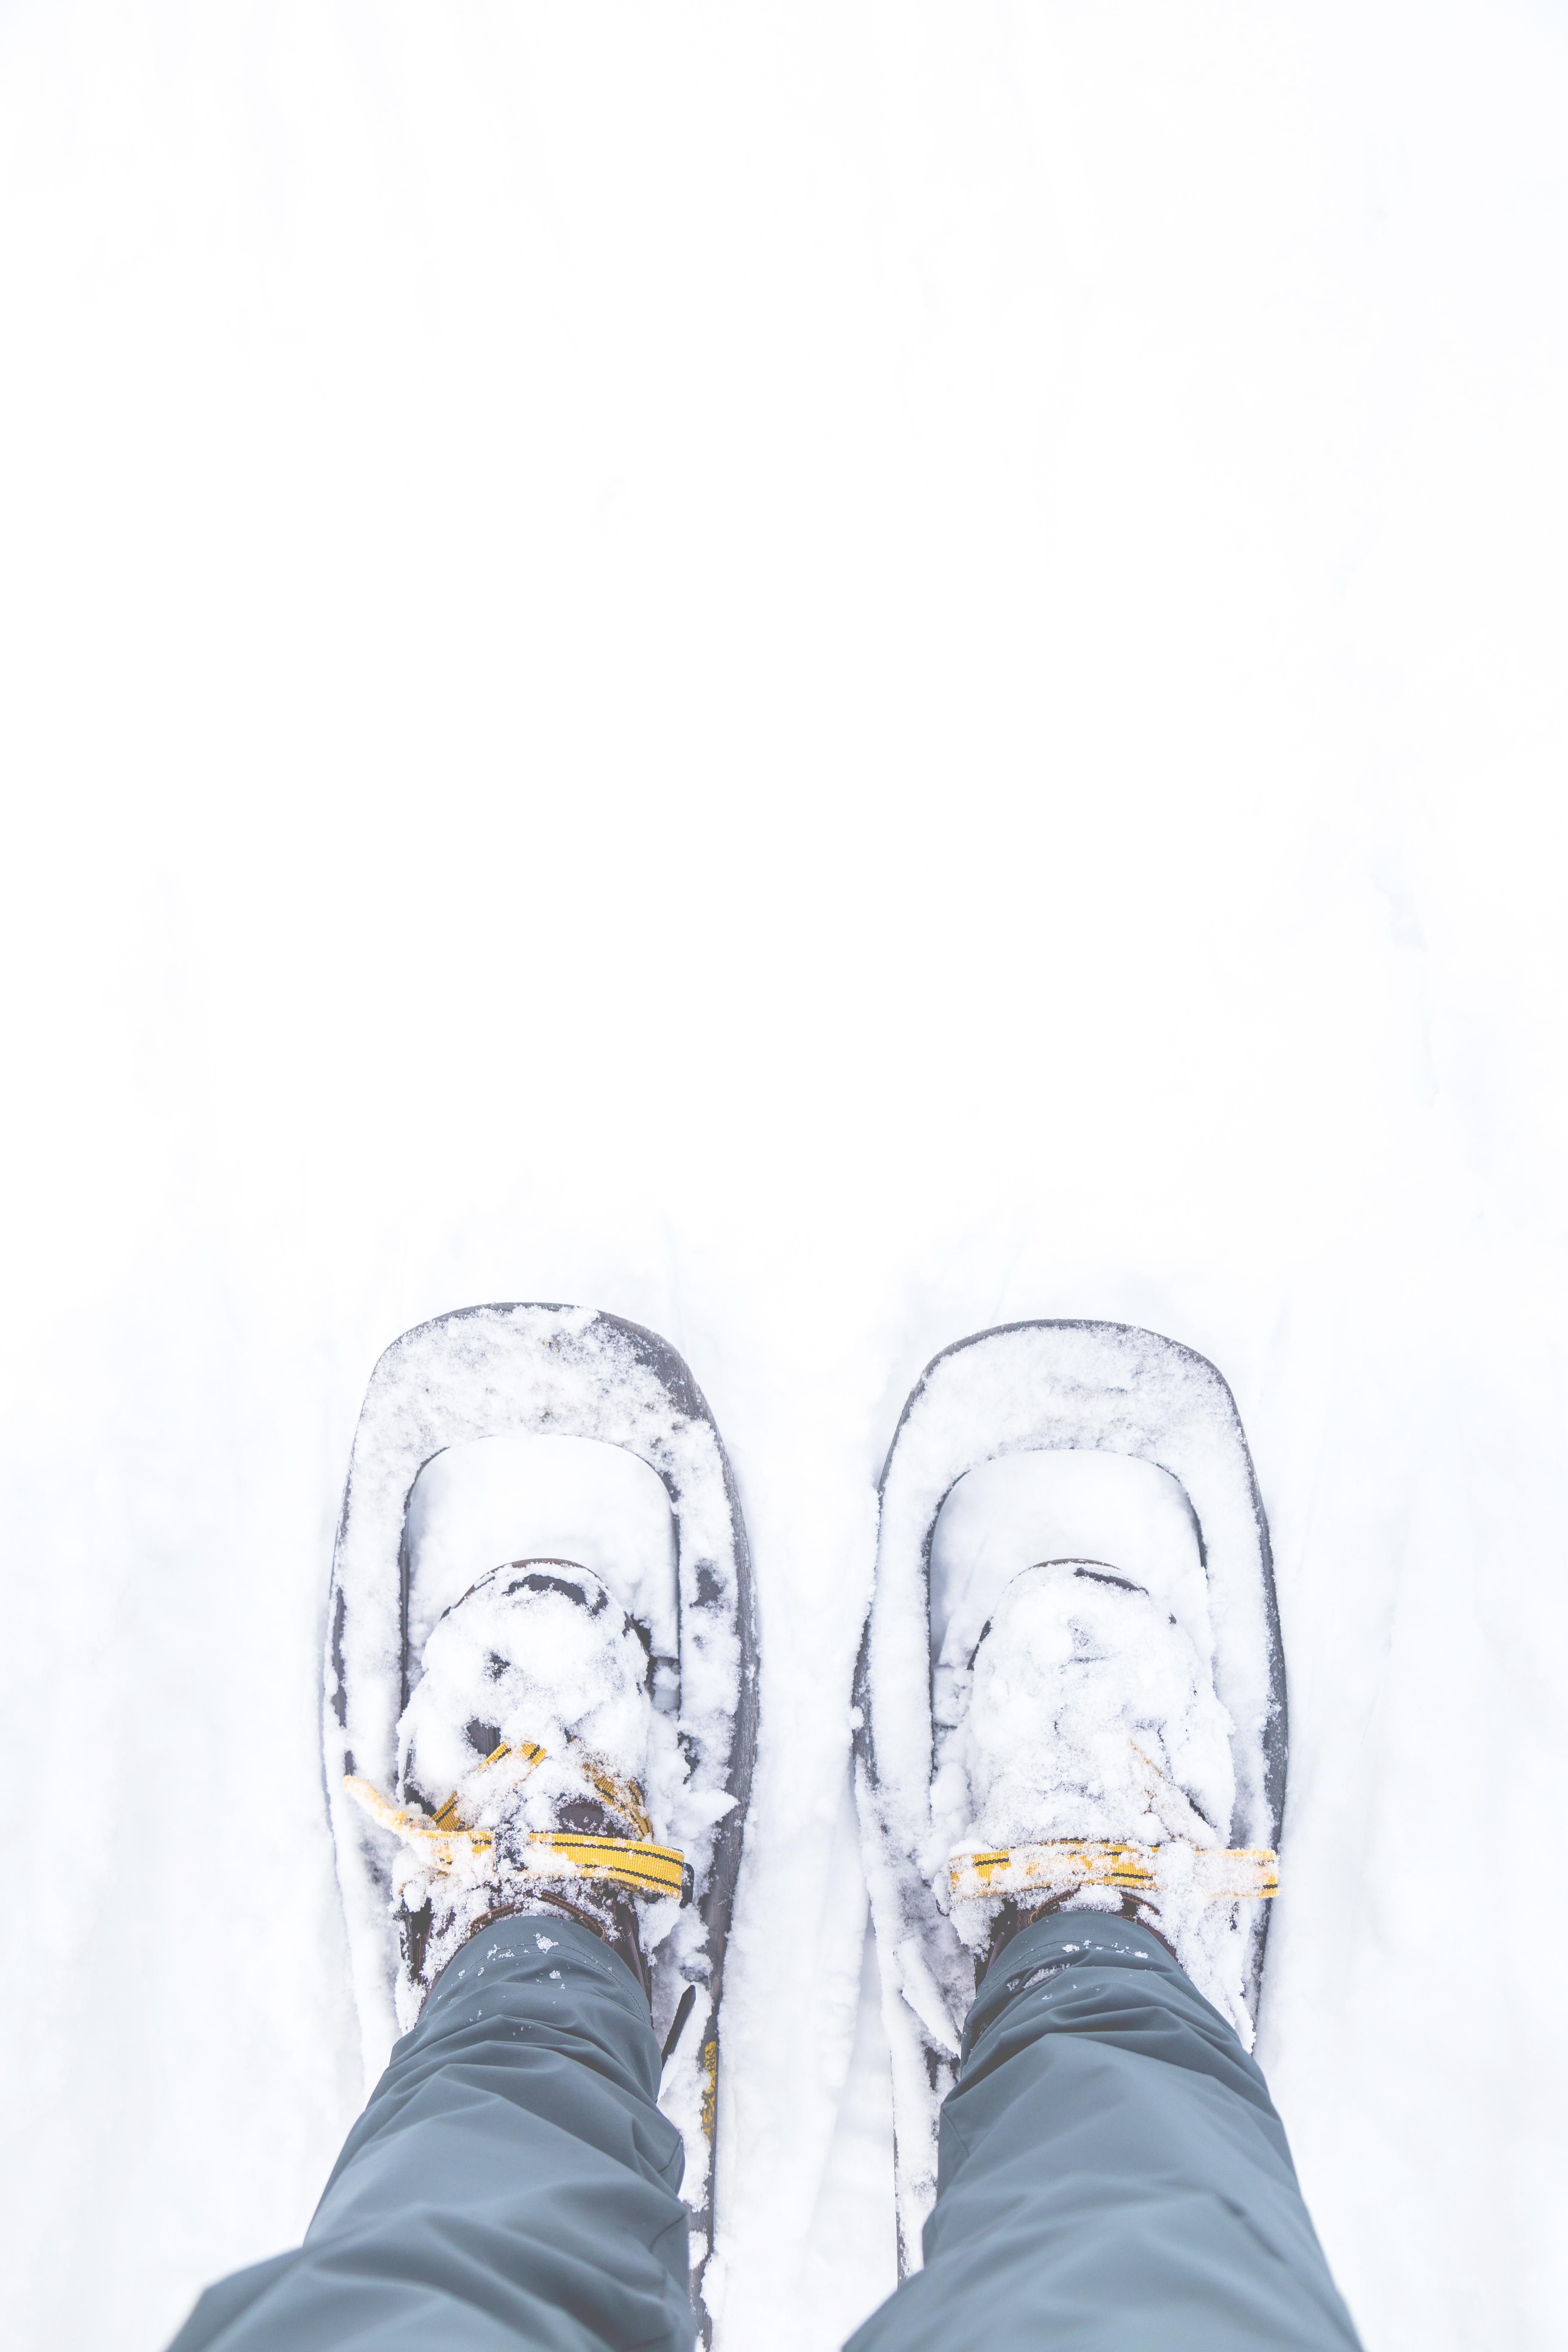 Cara Menggambar Sketsa Sepatu